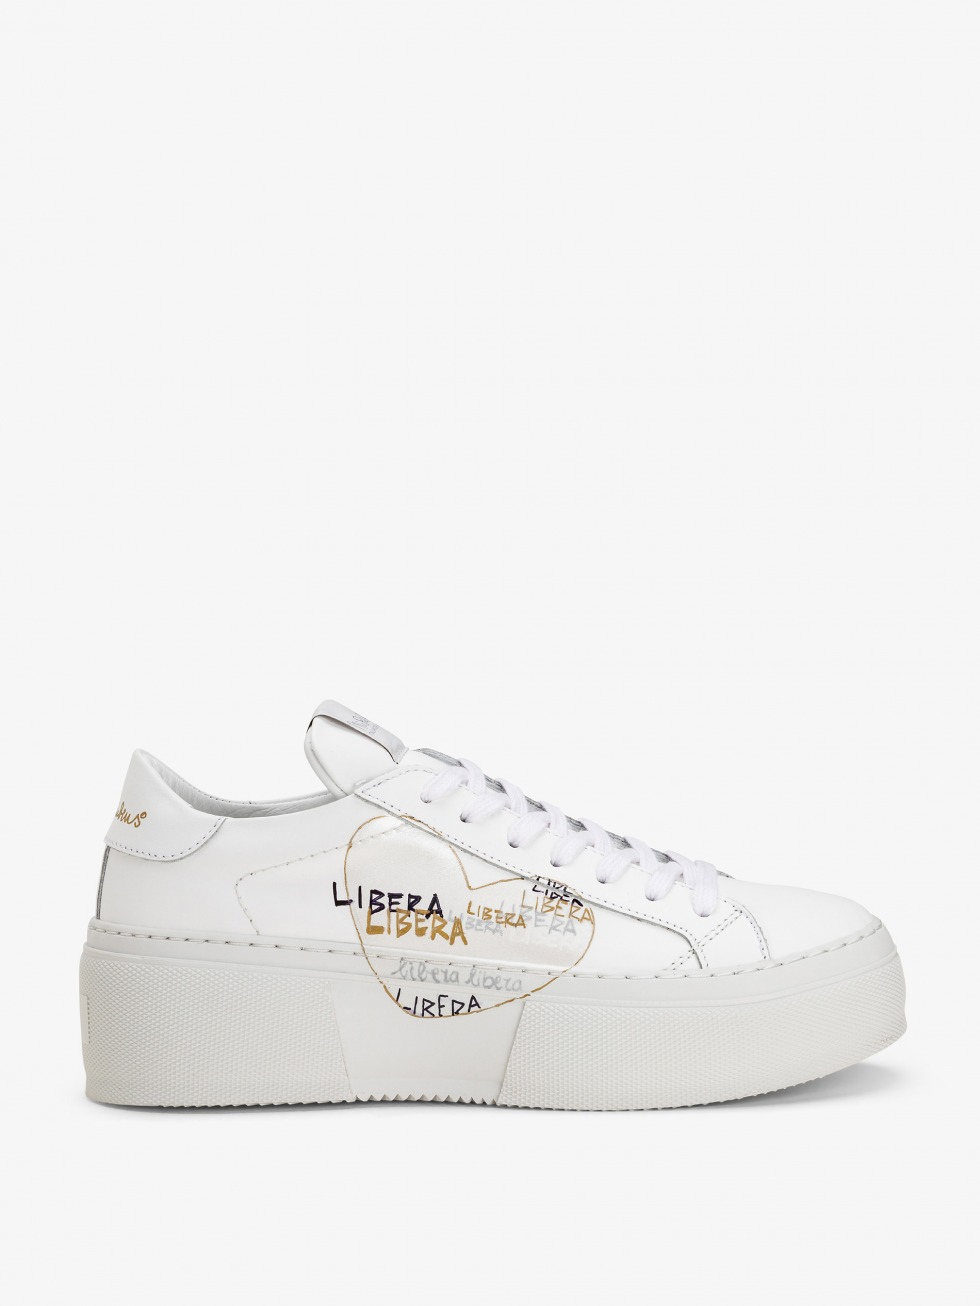 Platform Mimosa Sneakers - White Libera Heart